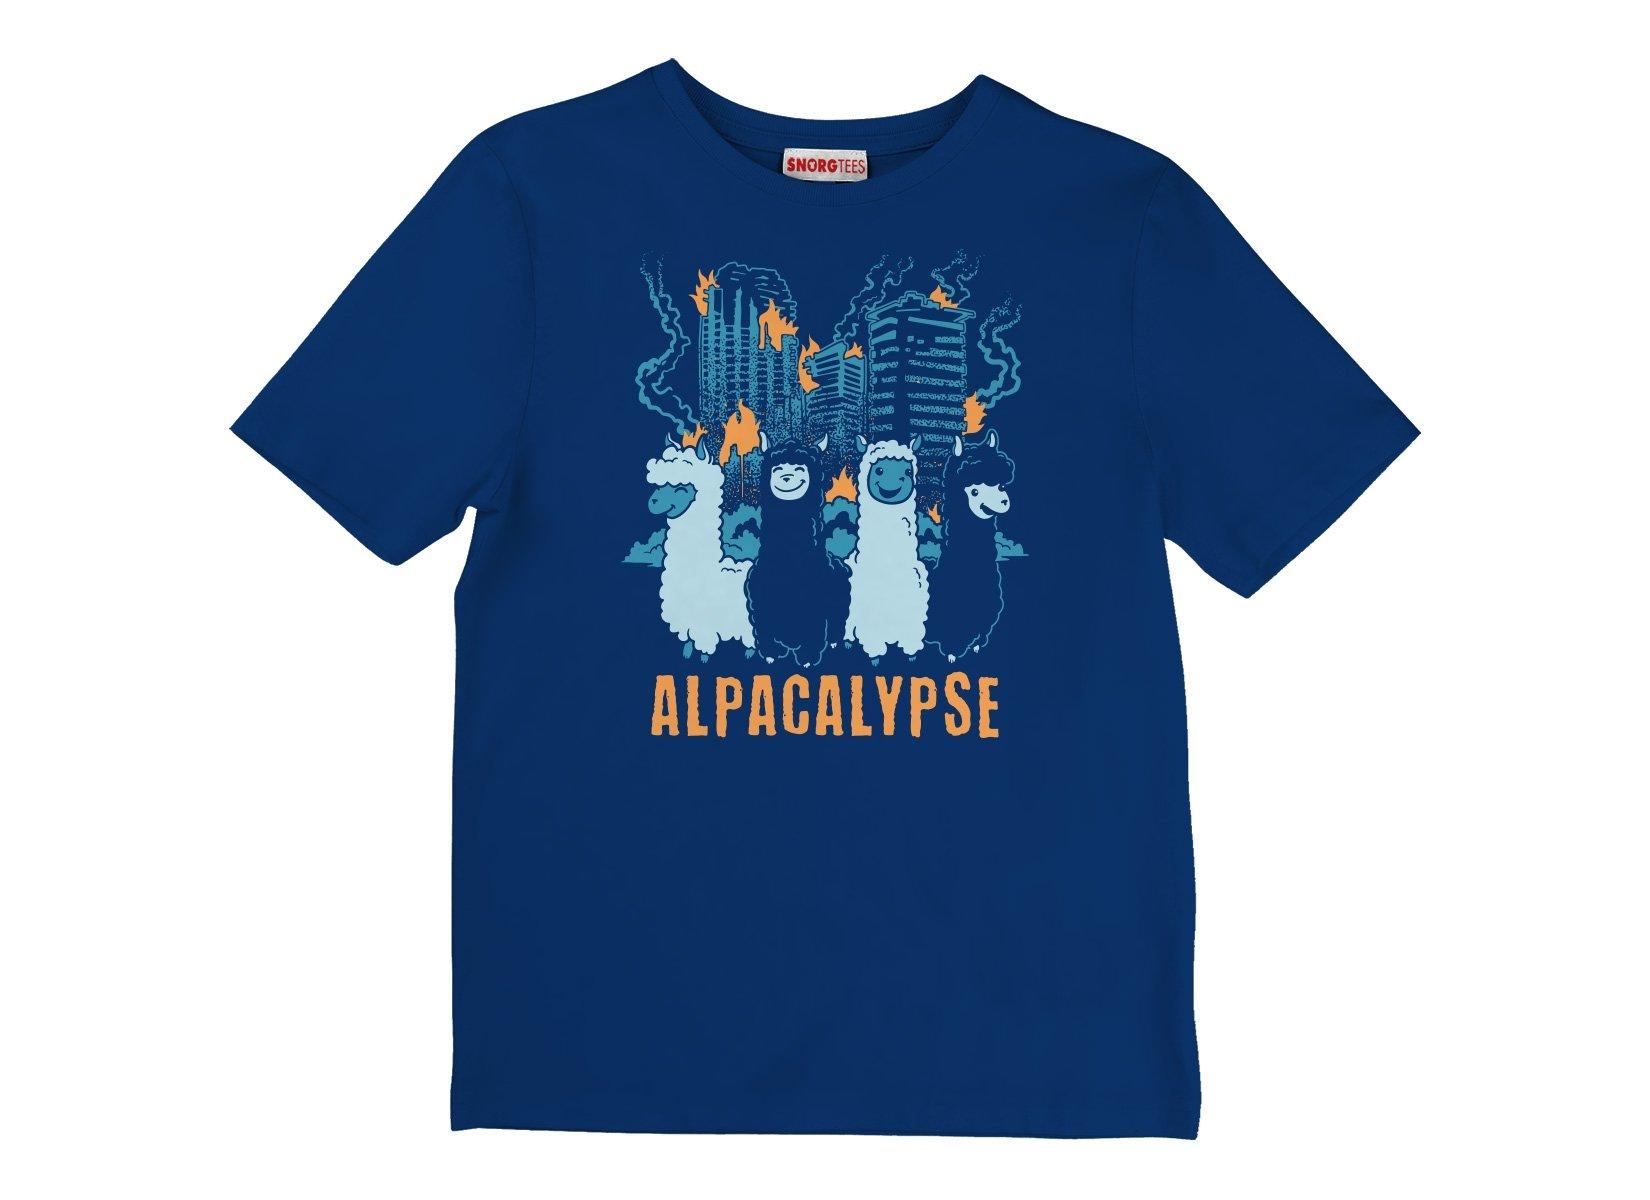 Alpacalypse on Kids T-Shirt